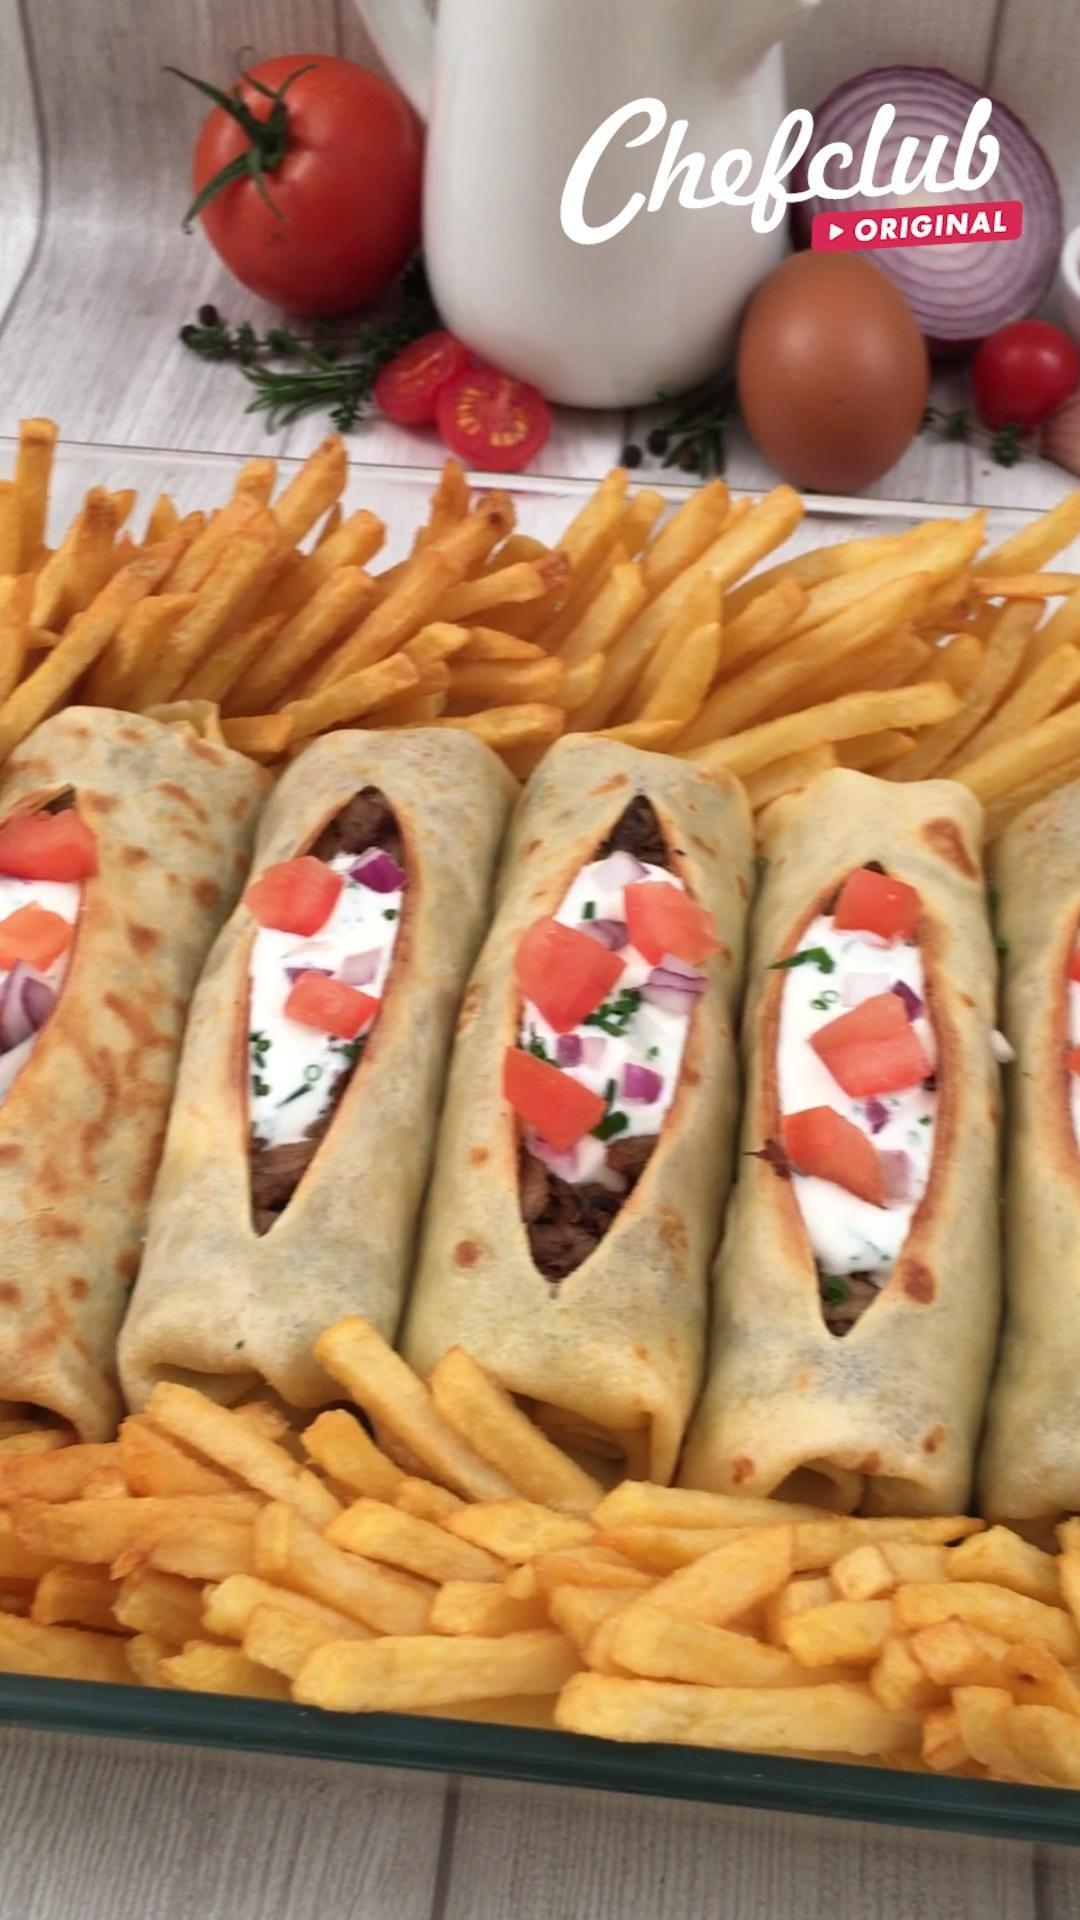 Crespella kebab